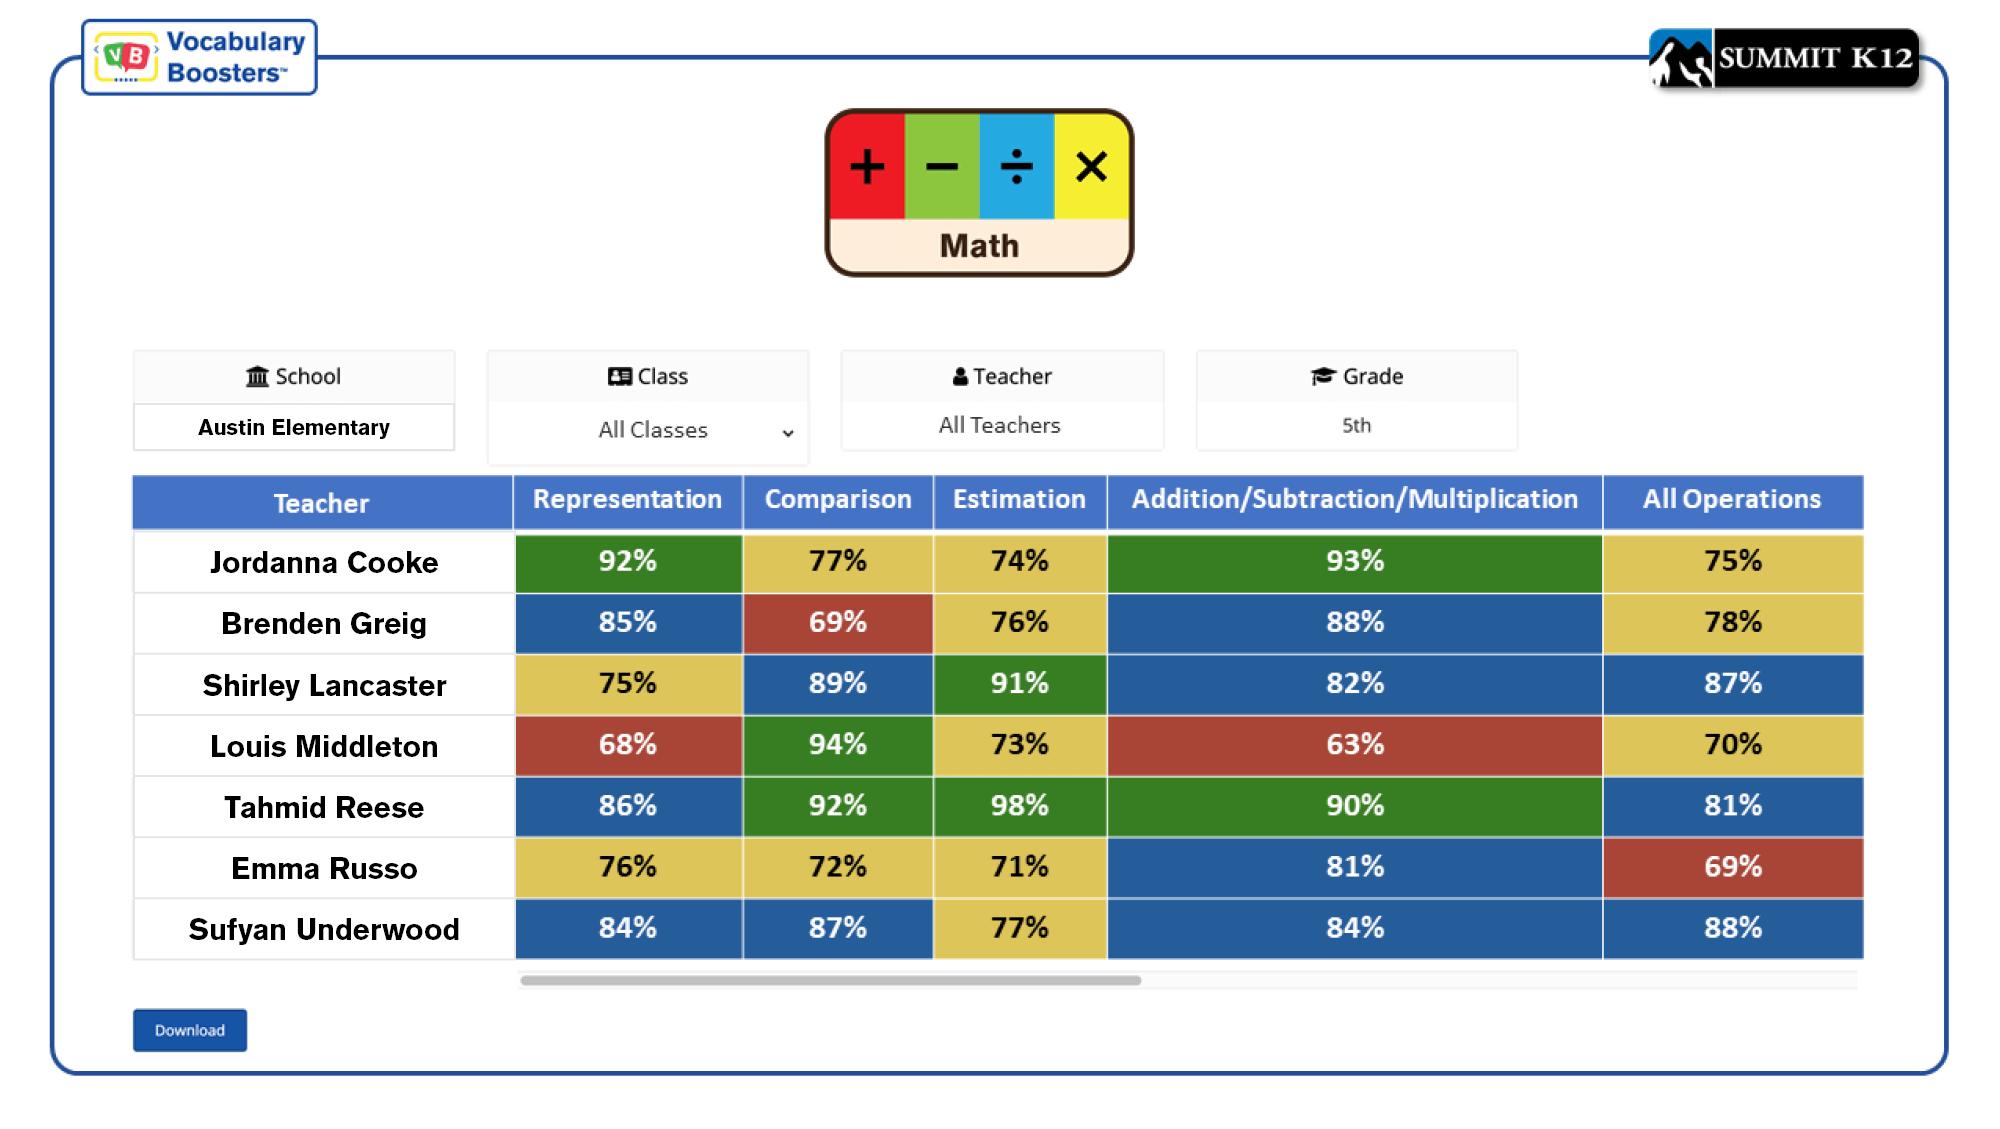 Vocabulary Boosters Teacher Report